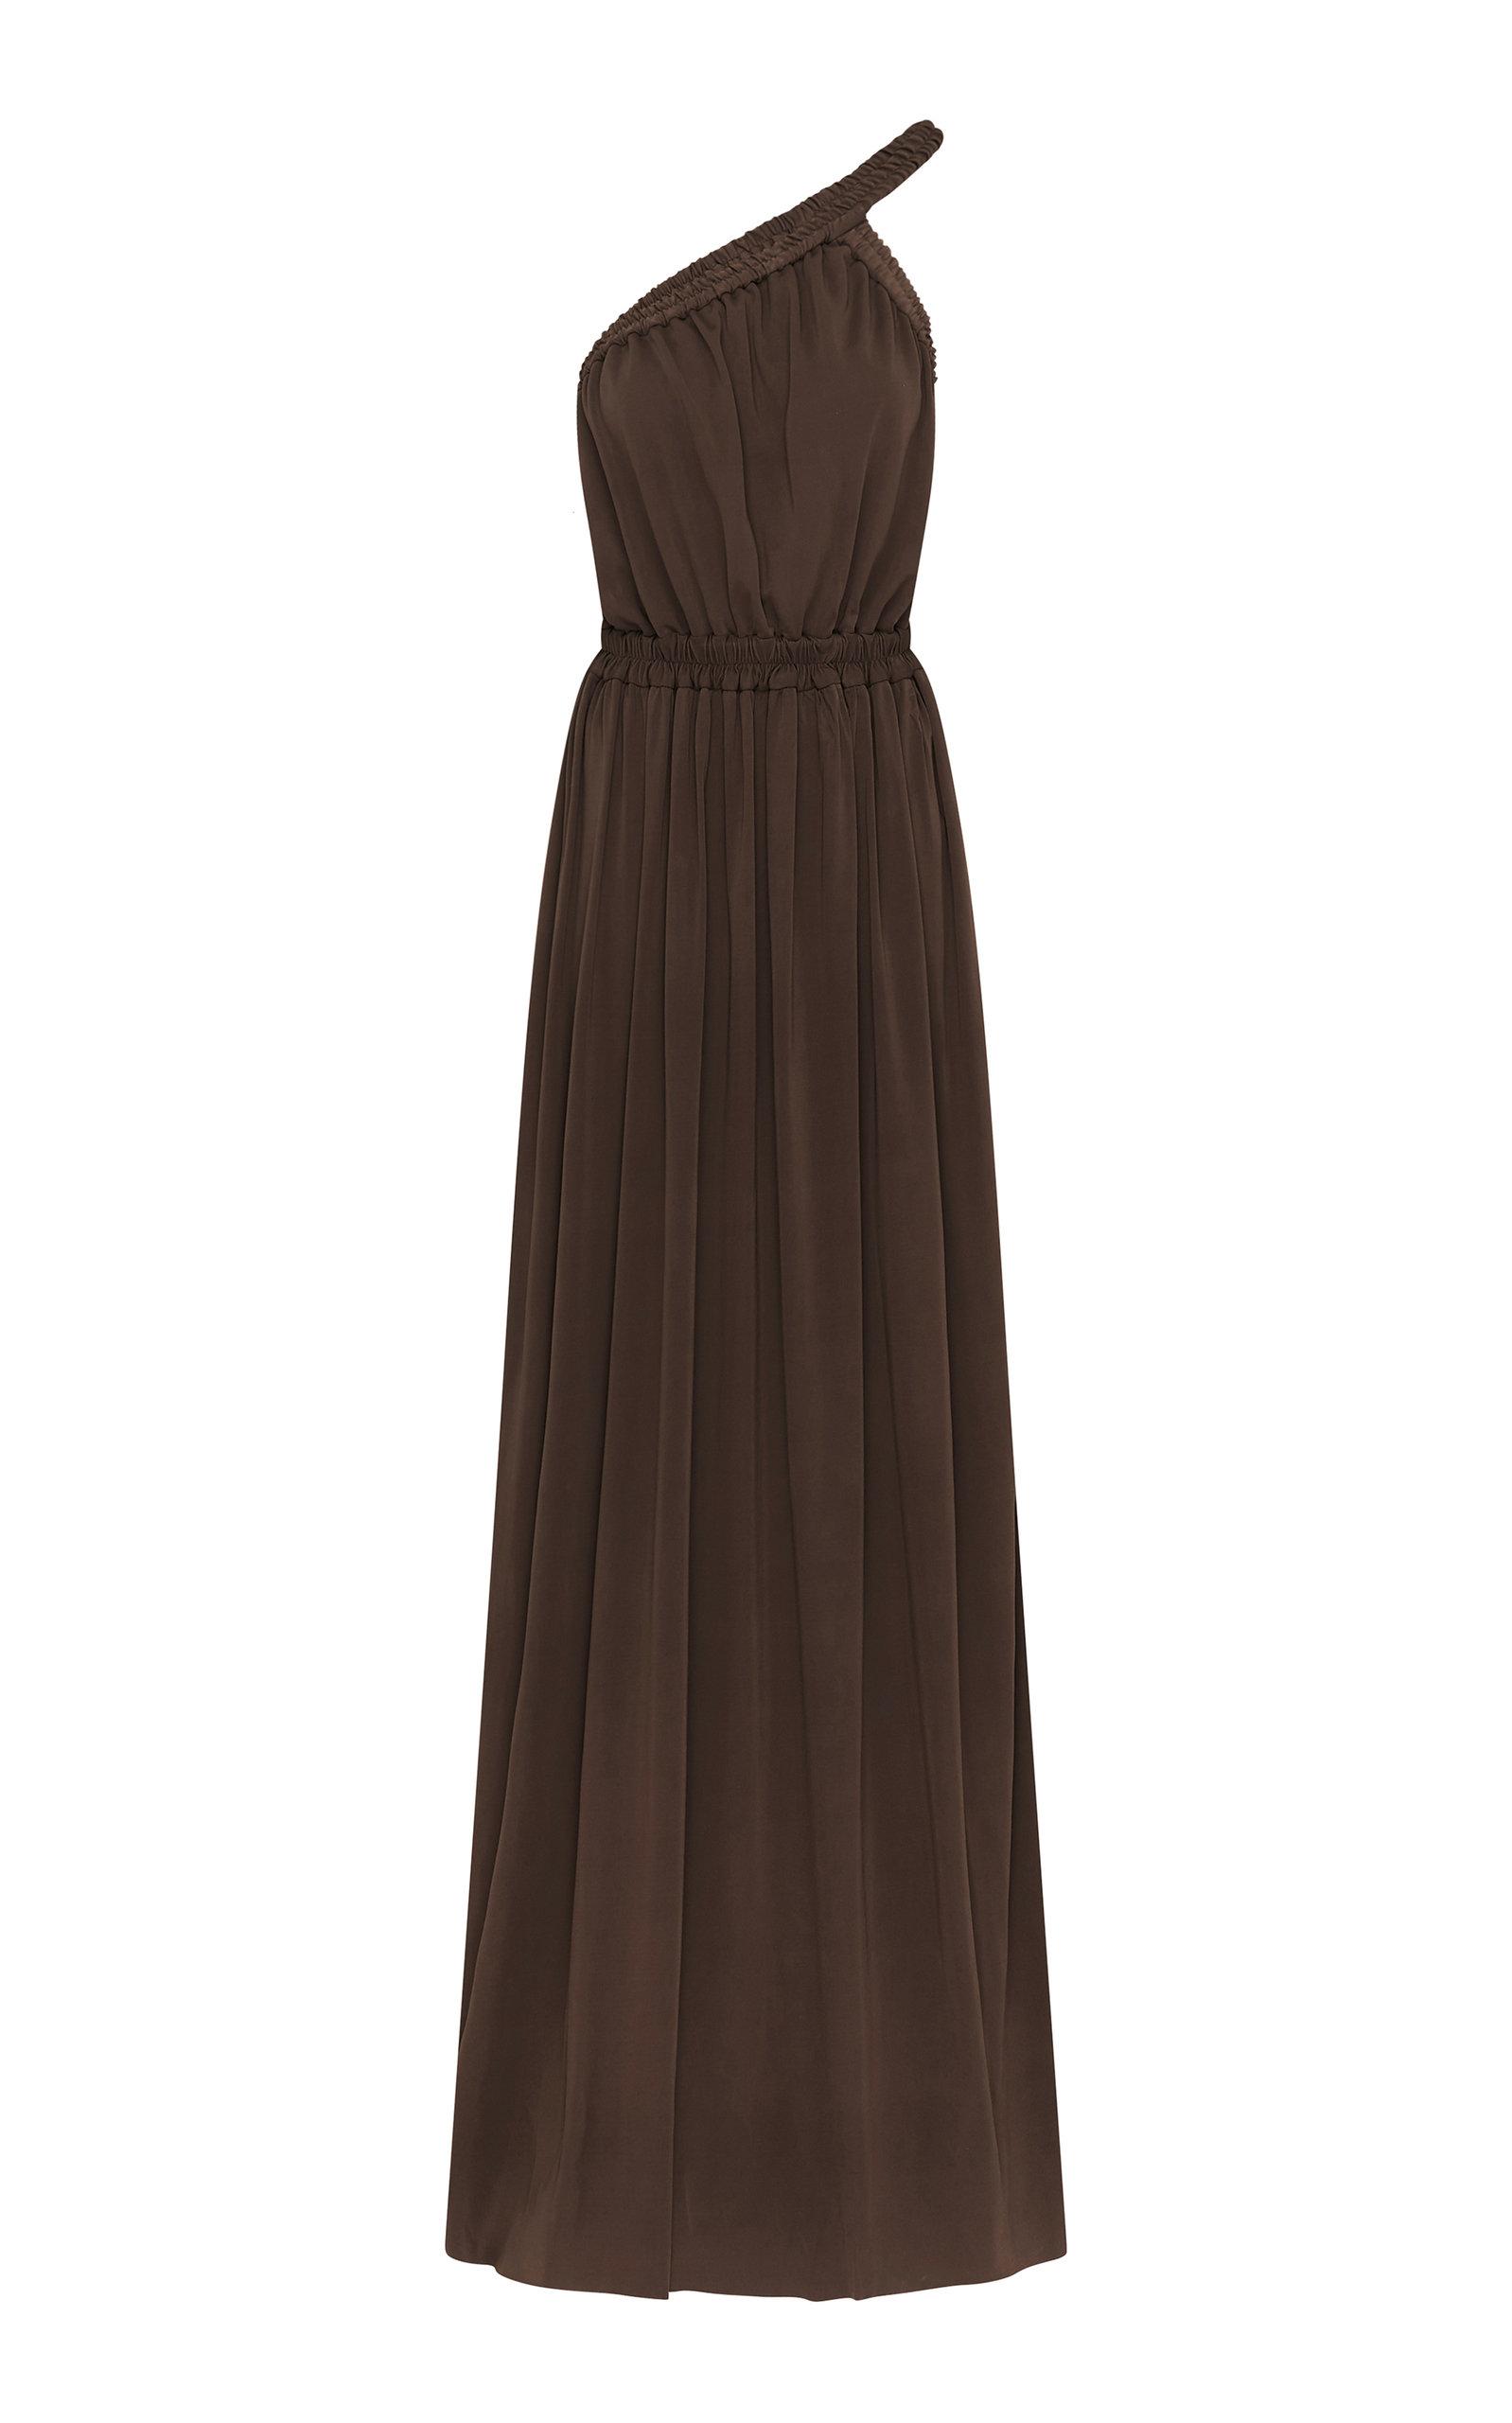 Buy Matteau Asymmetric Halter Jersey Maxi Dress online, shop Matteau at the best price